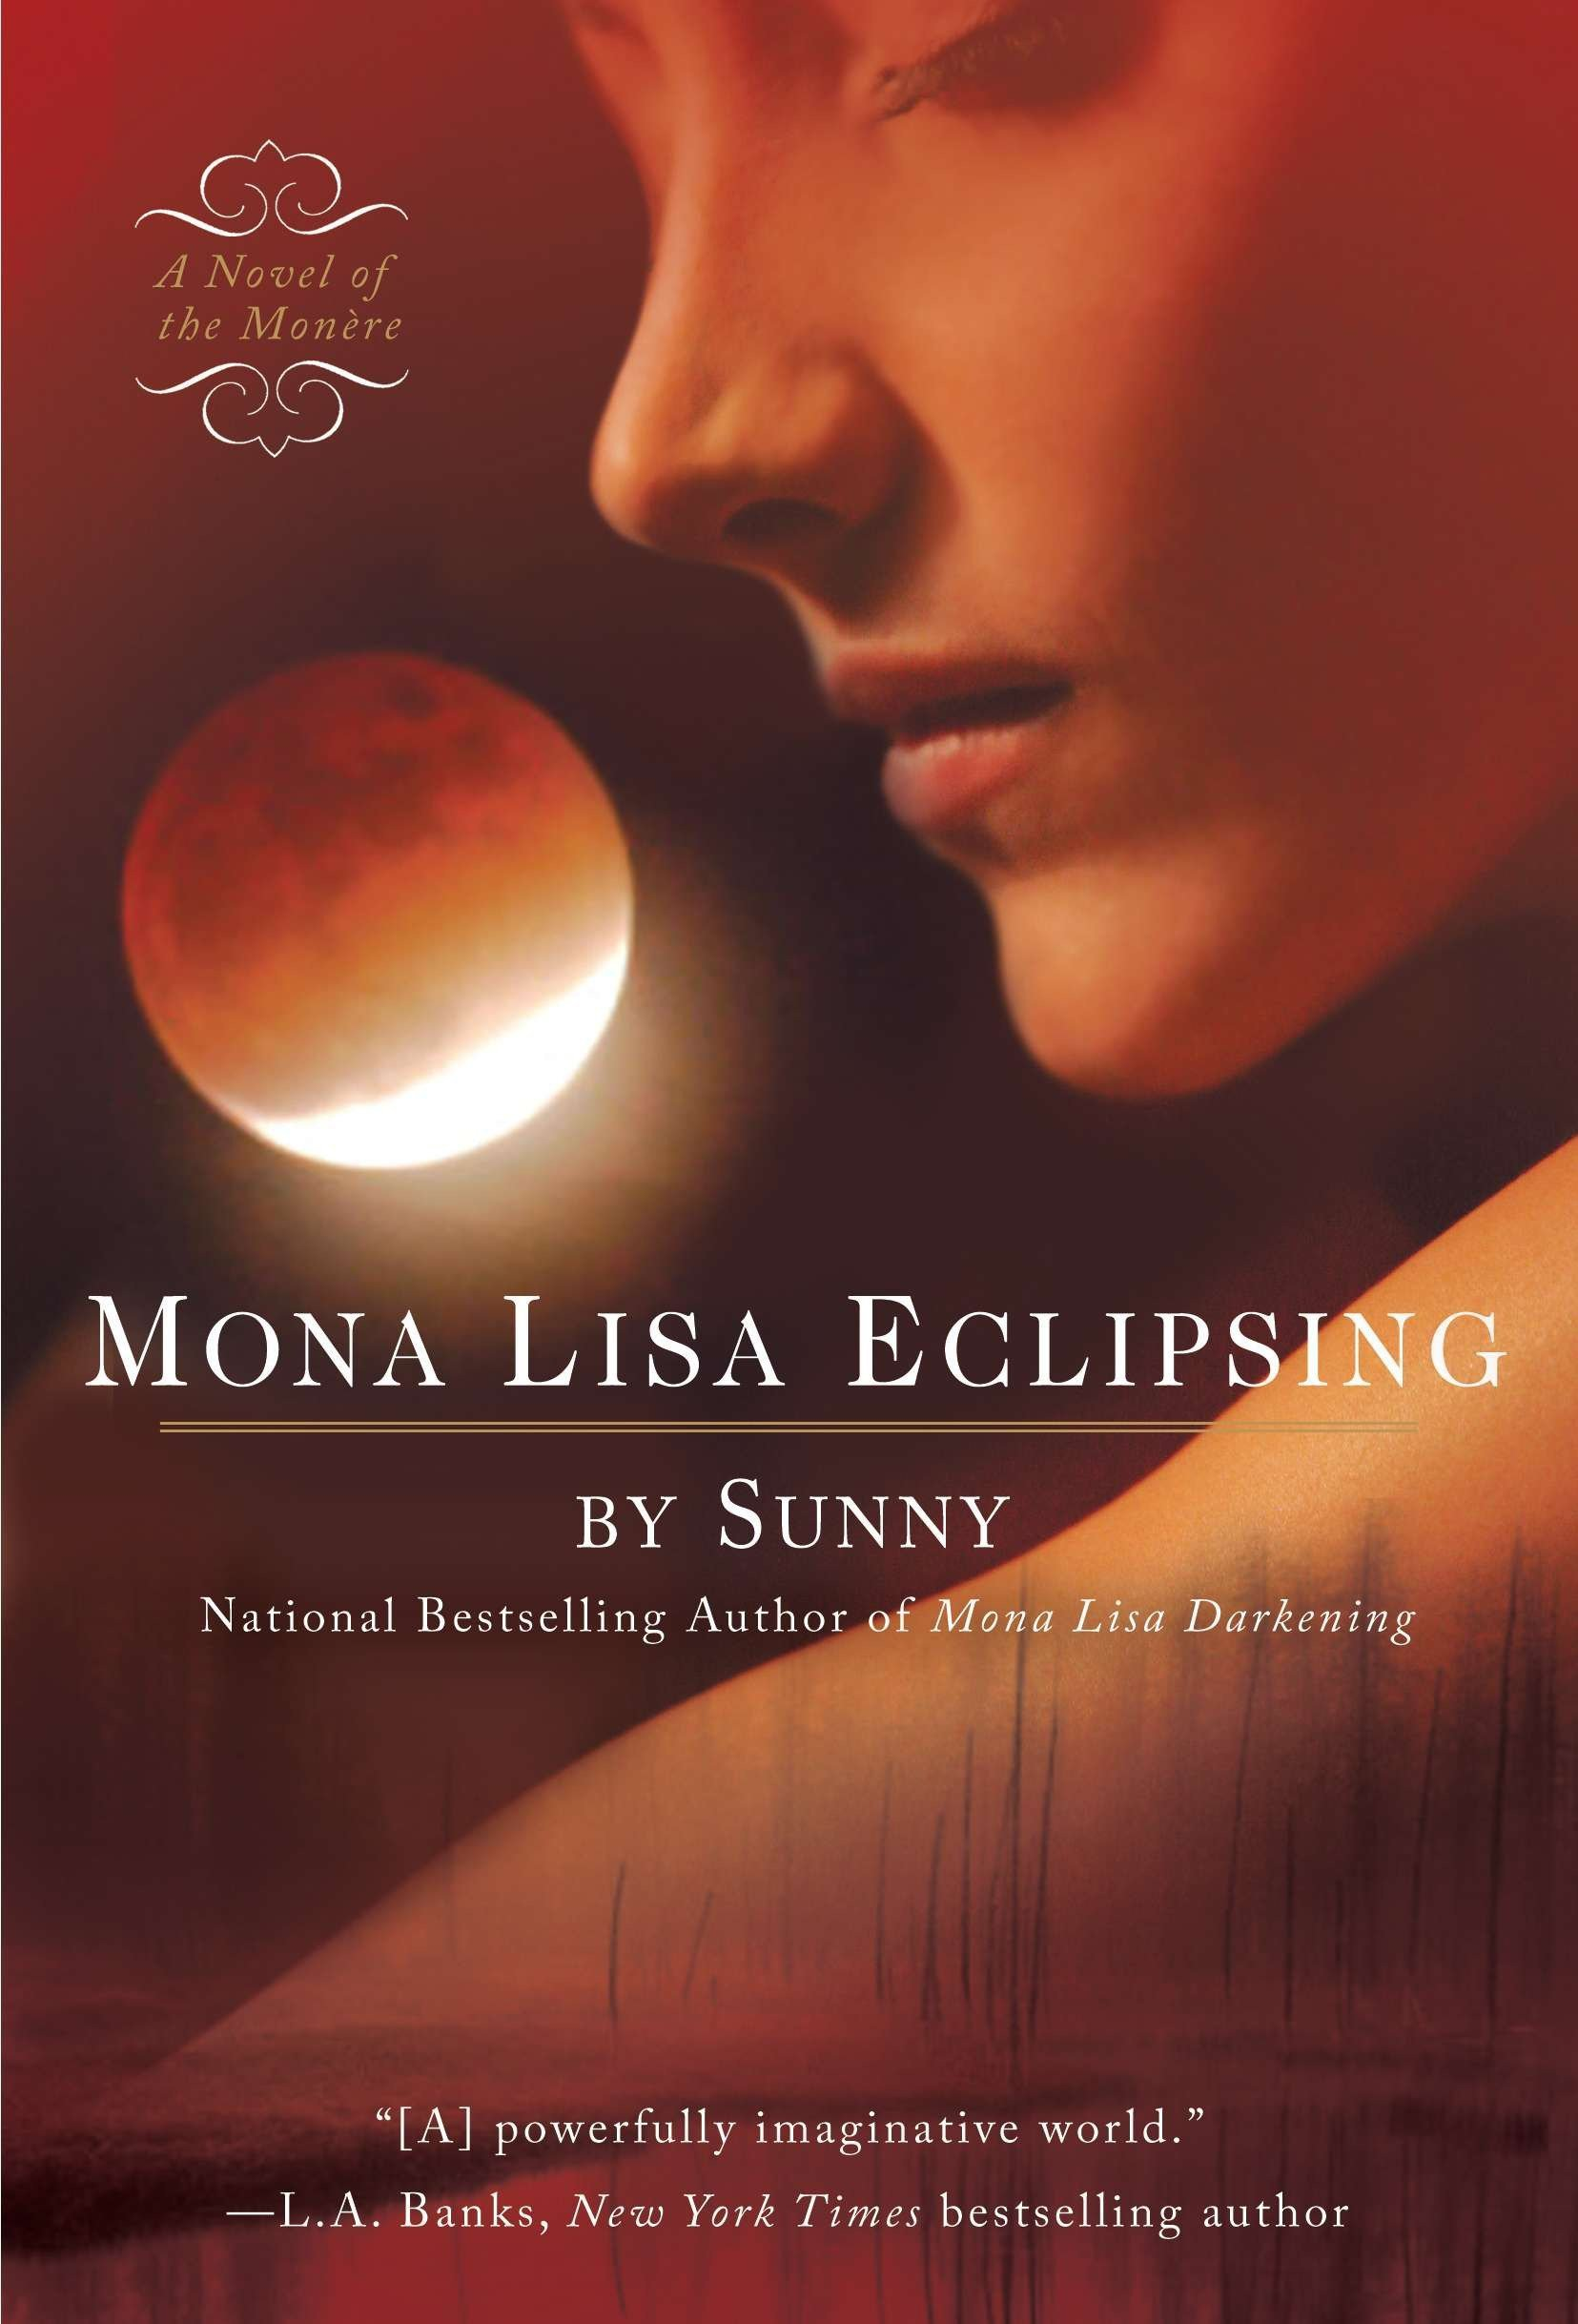 Download Mona Lisa Eclipsing (A Novel of the Monere) pdf